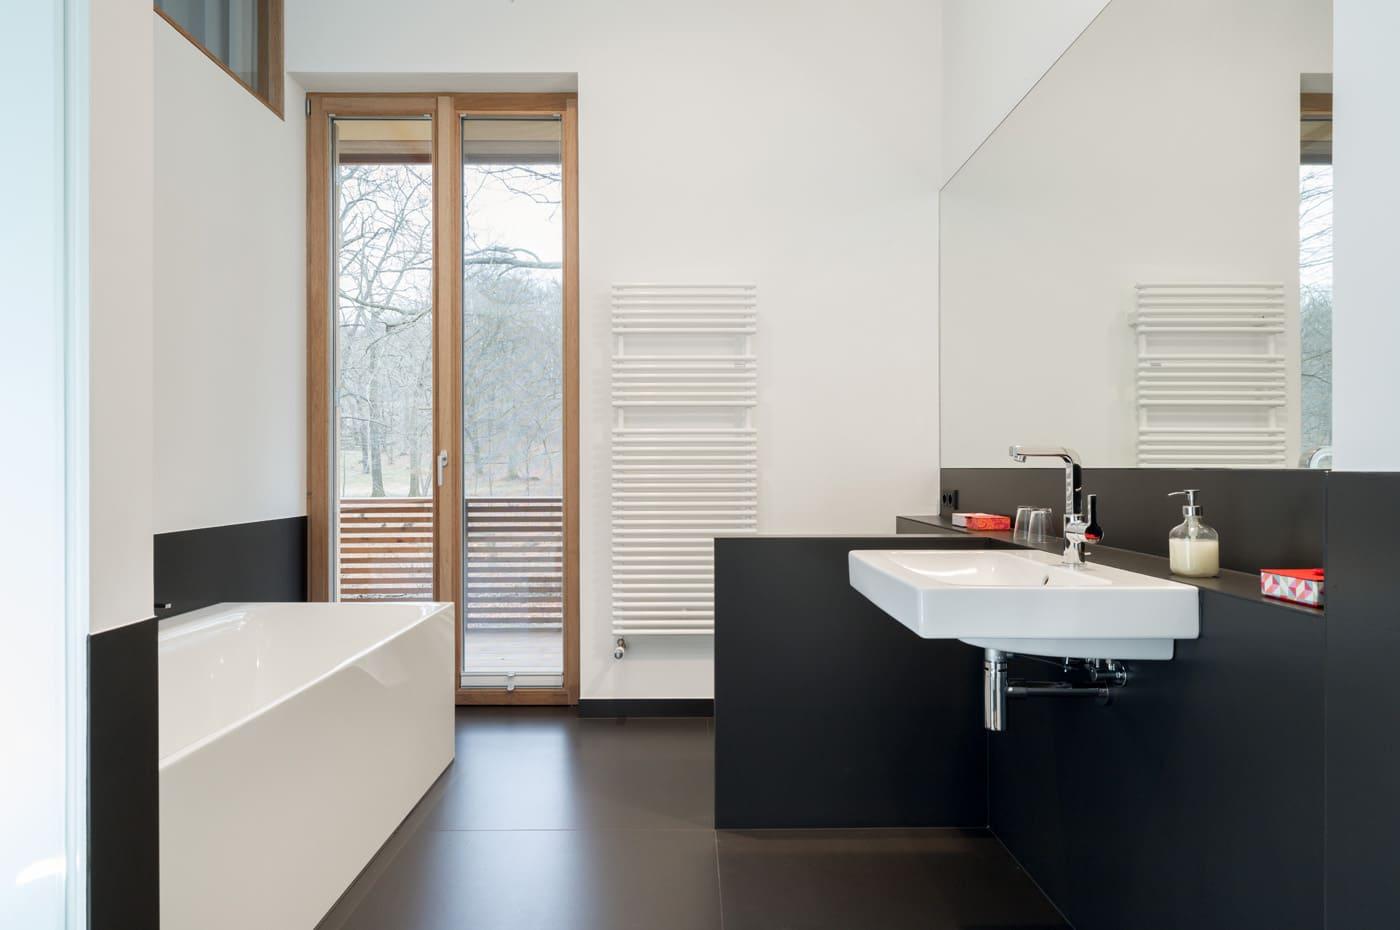 bel étage - Park, Bad mit Dusche & Wanne